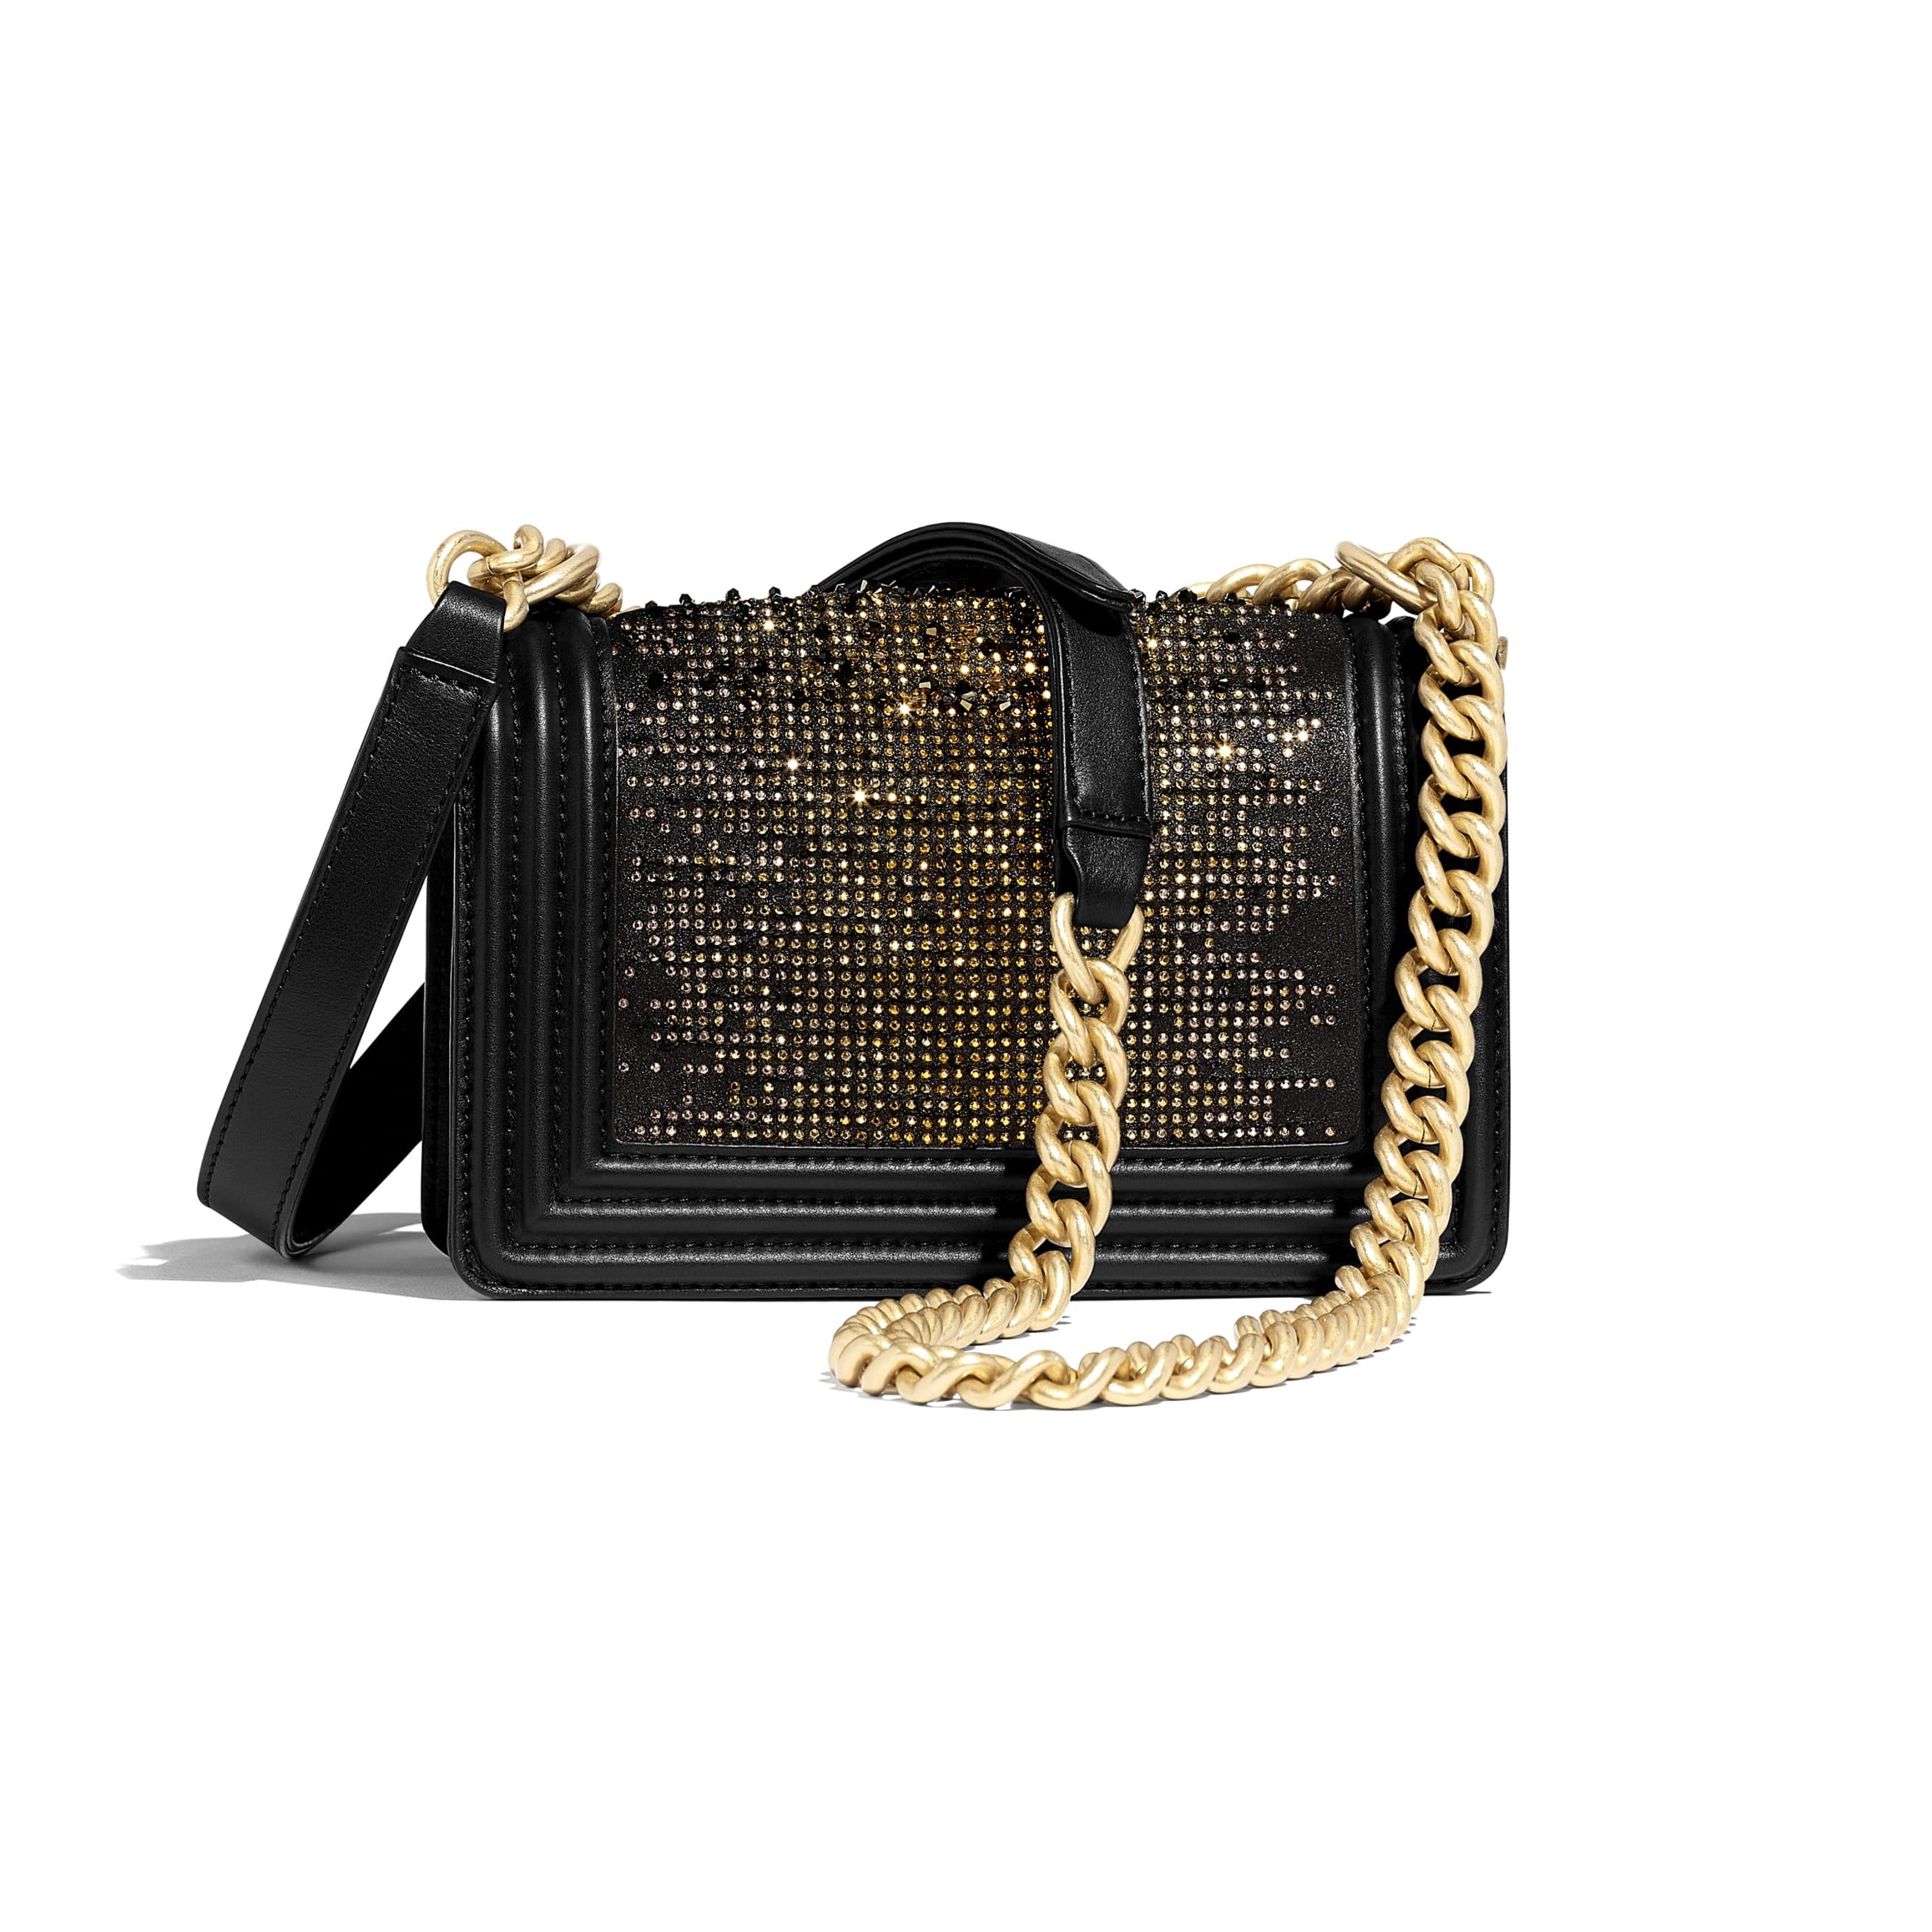 Small BOY CHANEL Handbag - Black - Calfskin, Strass & Gold-Tone Metal - Alternative view - see standard sized version